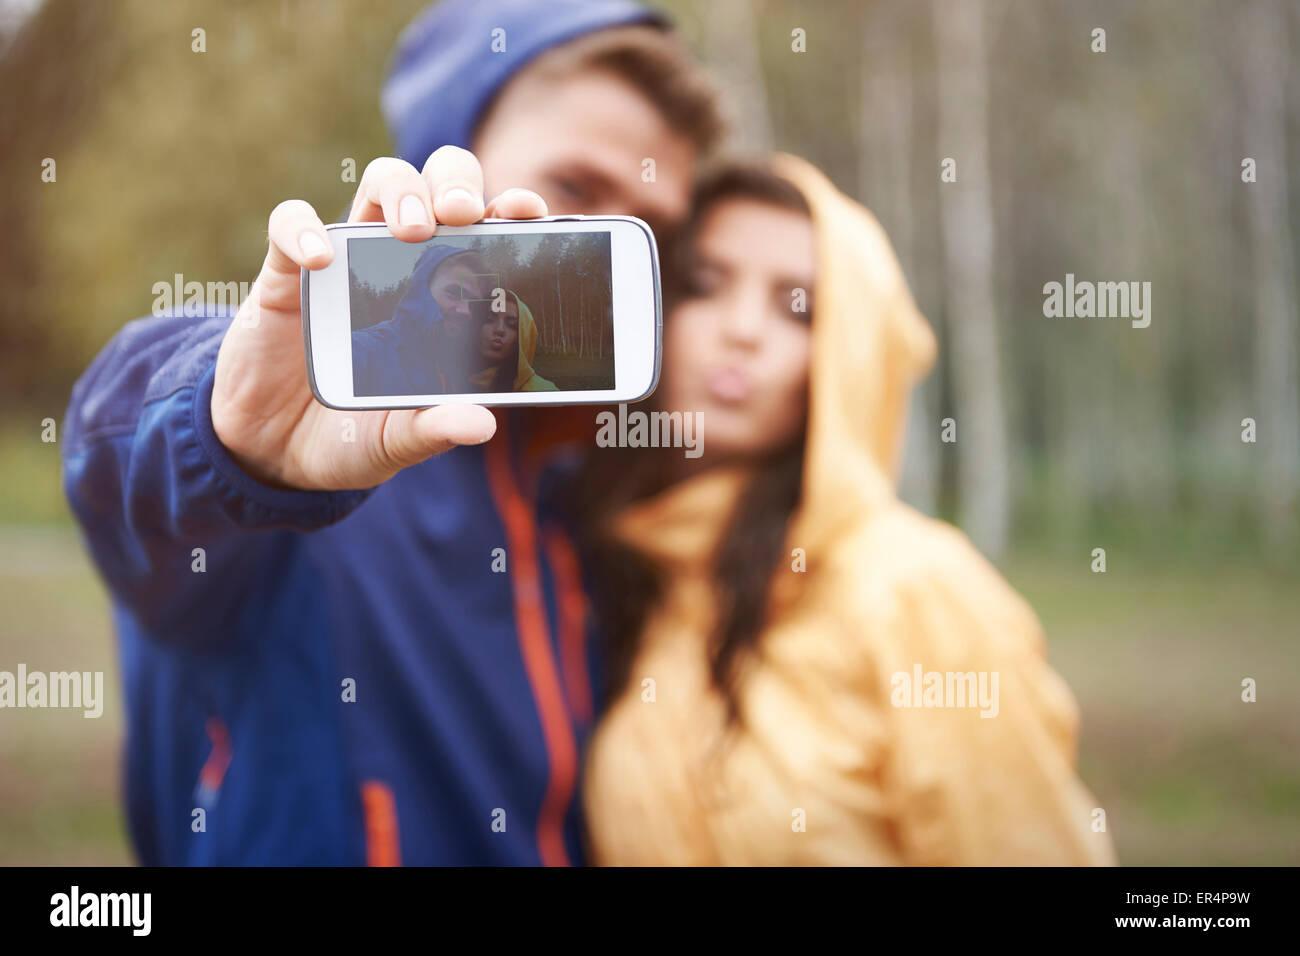 Captura de memoria en días lluviosos. Debica, Polonia Imagen De Stock